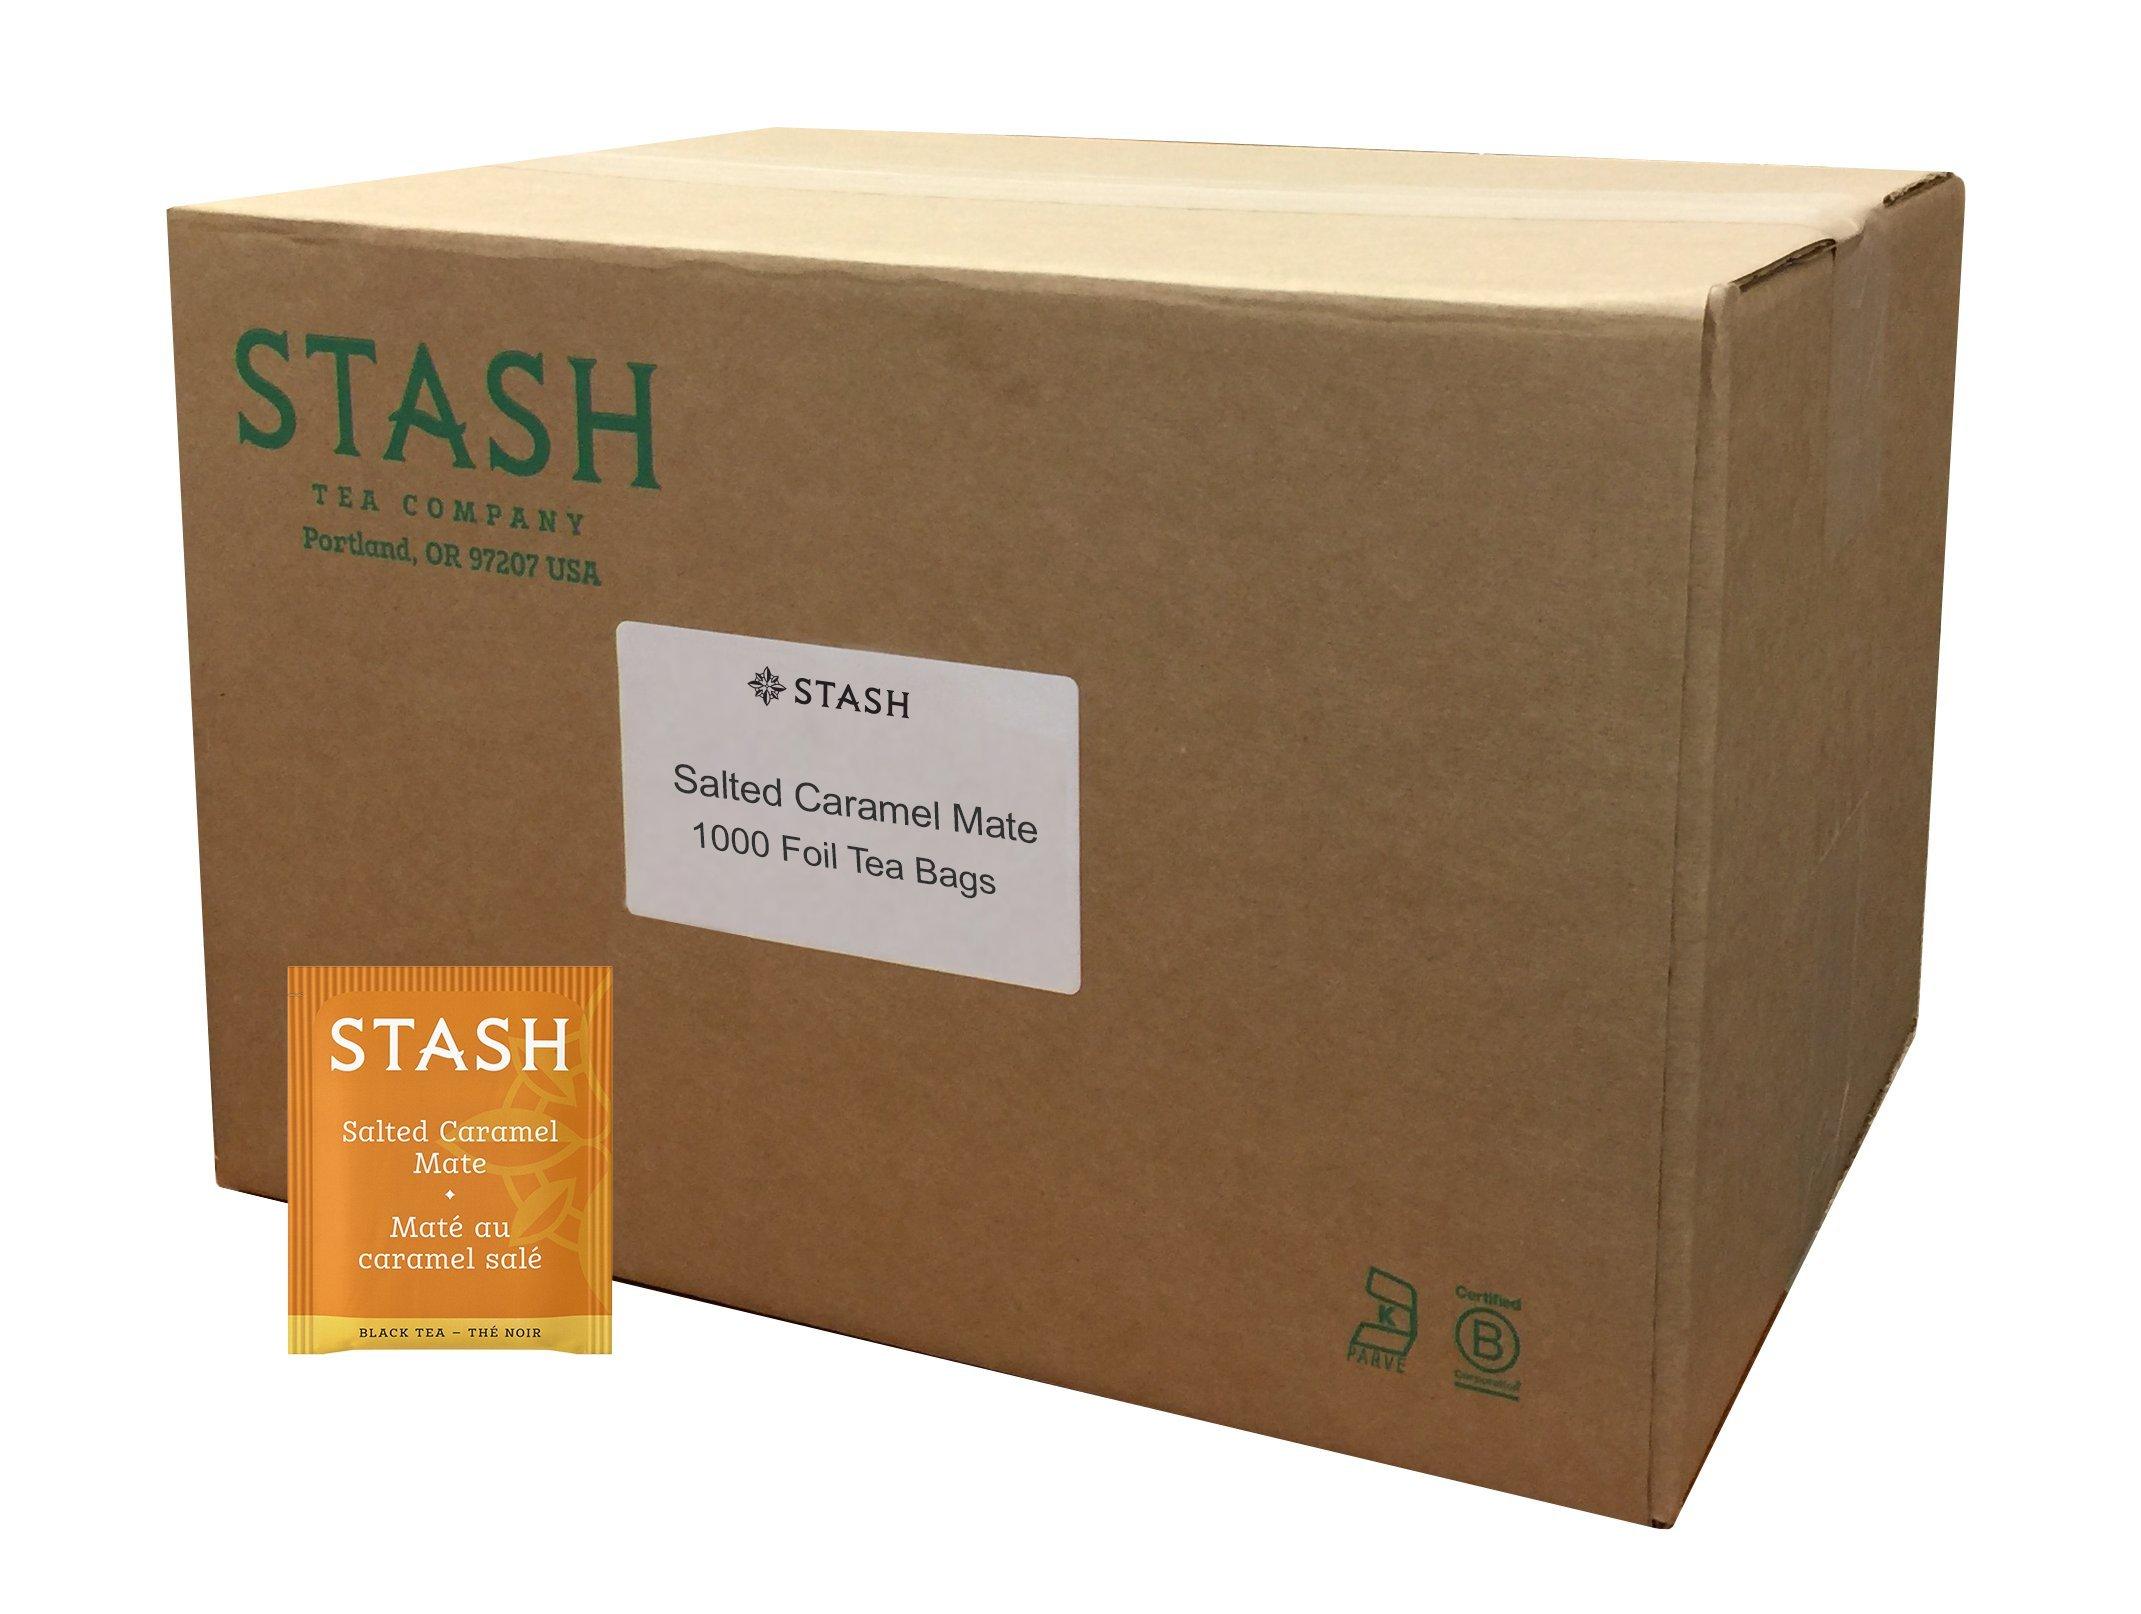 Stash Tea Salted Caramel Mate, Yerba Mate Tea, 1000 Count Box of Teabags in Foil by Stash Tea (Image #1)